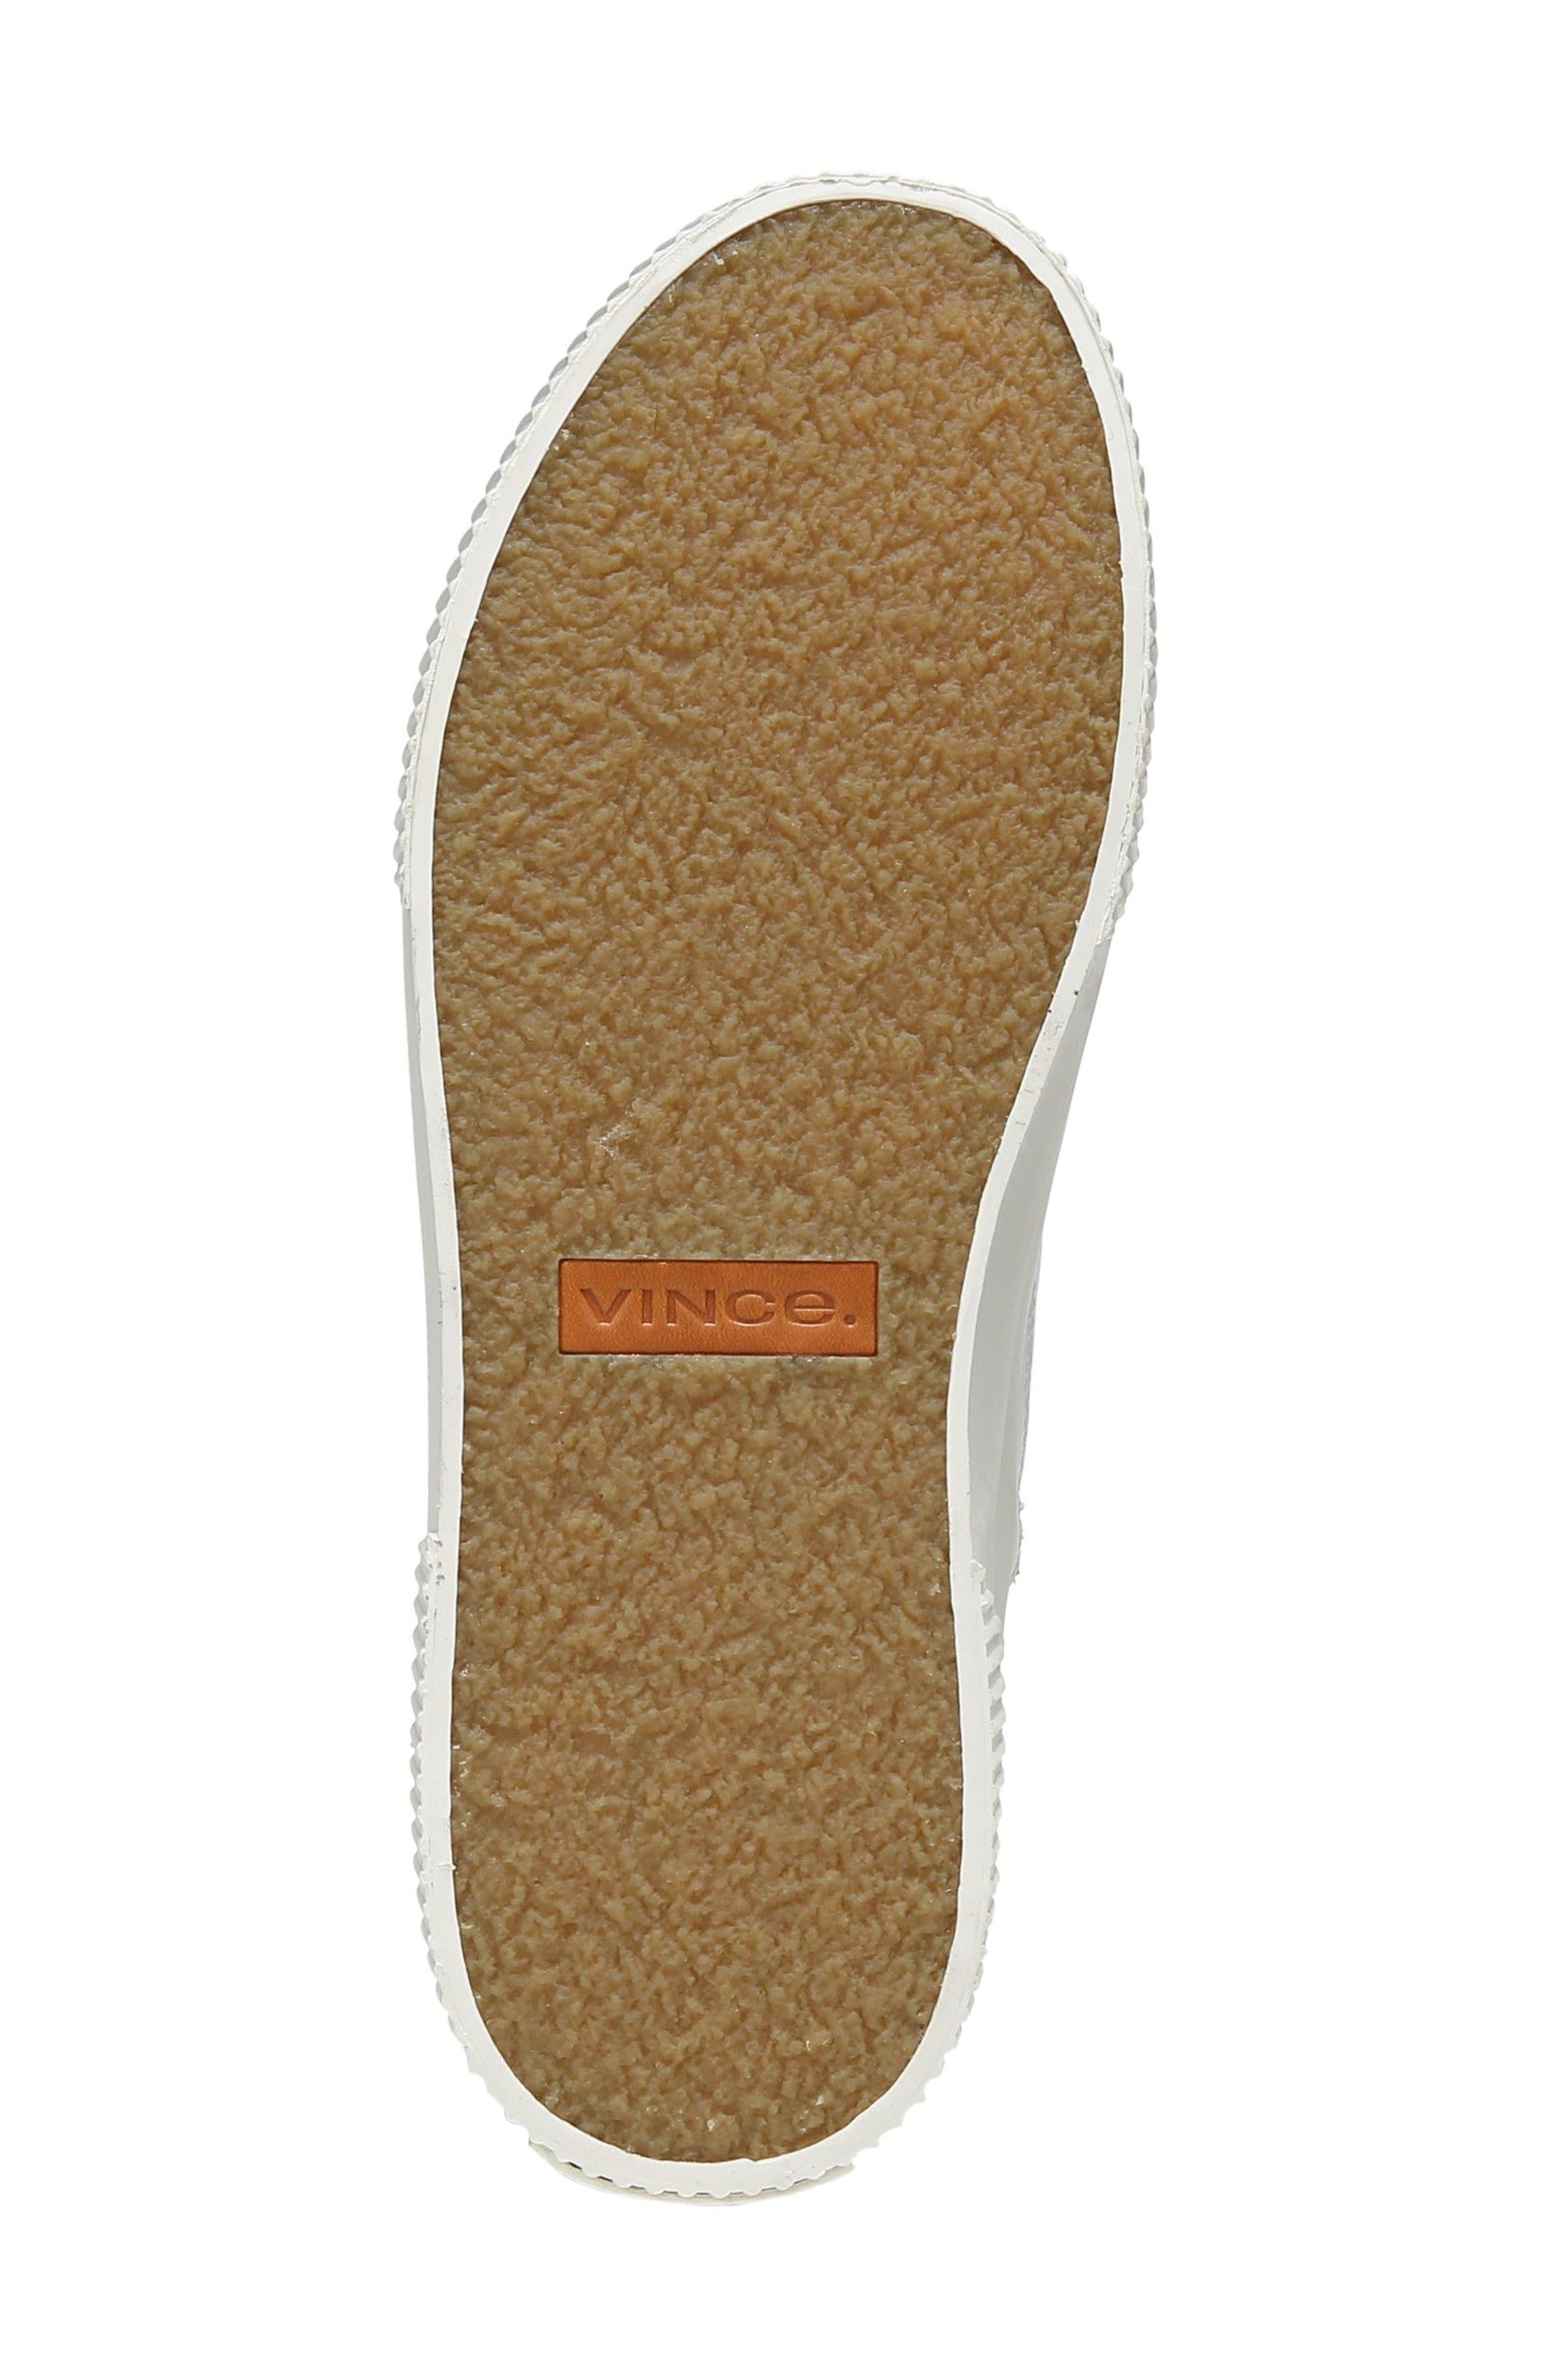 Kiles High-Top Sneaker,                             Alternate thumbnail 6, color,                             100